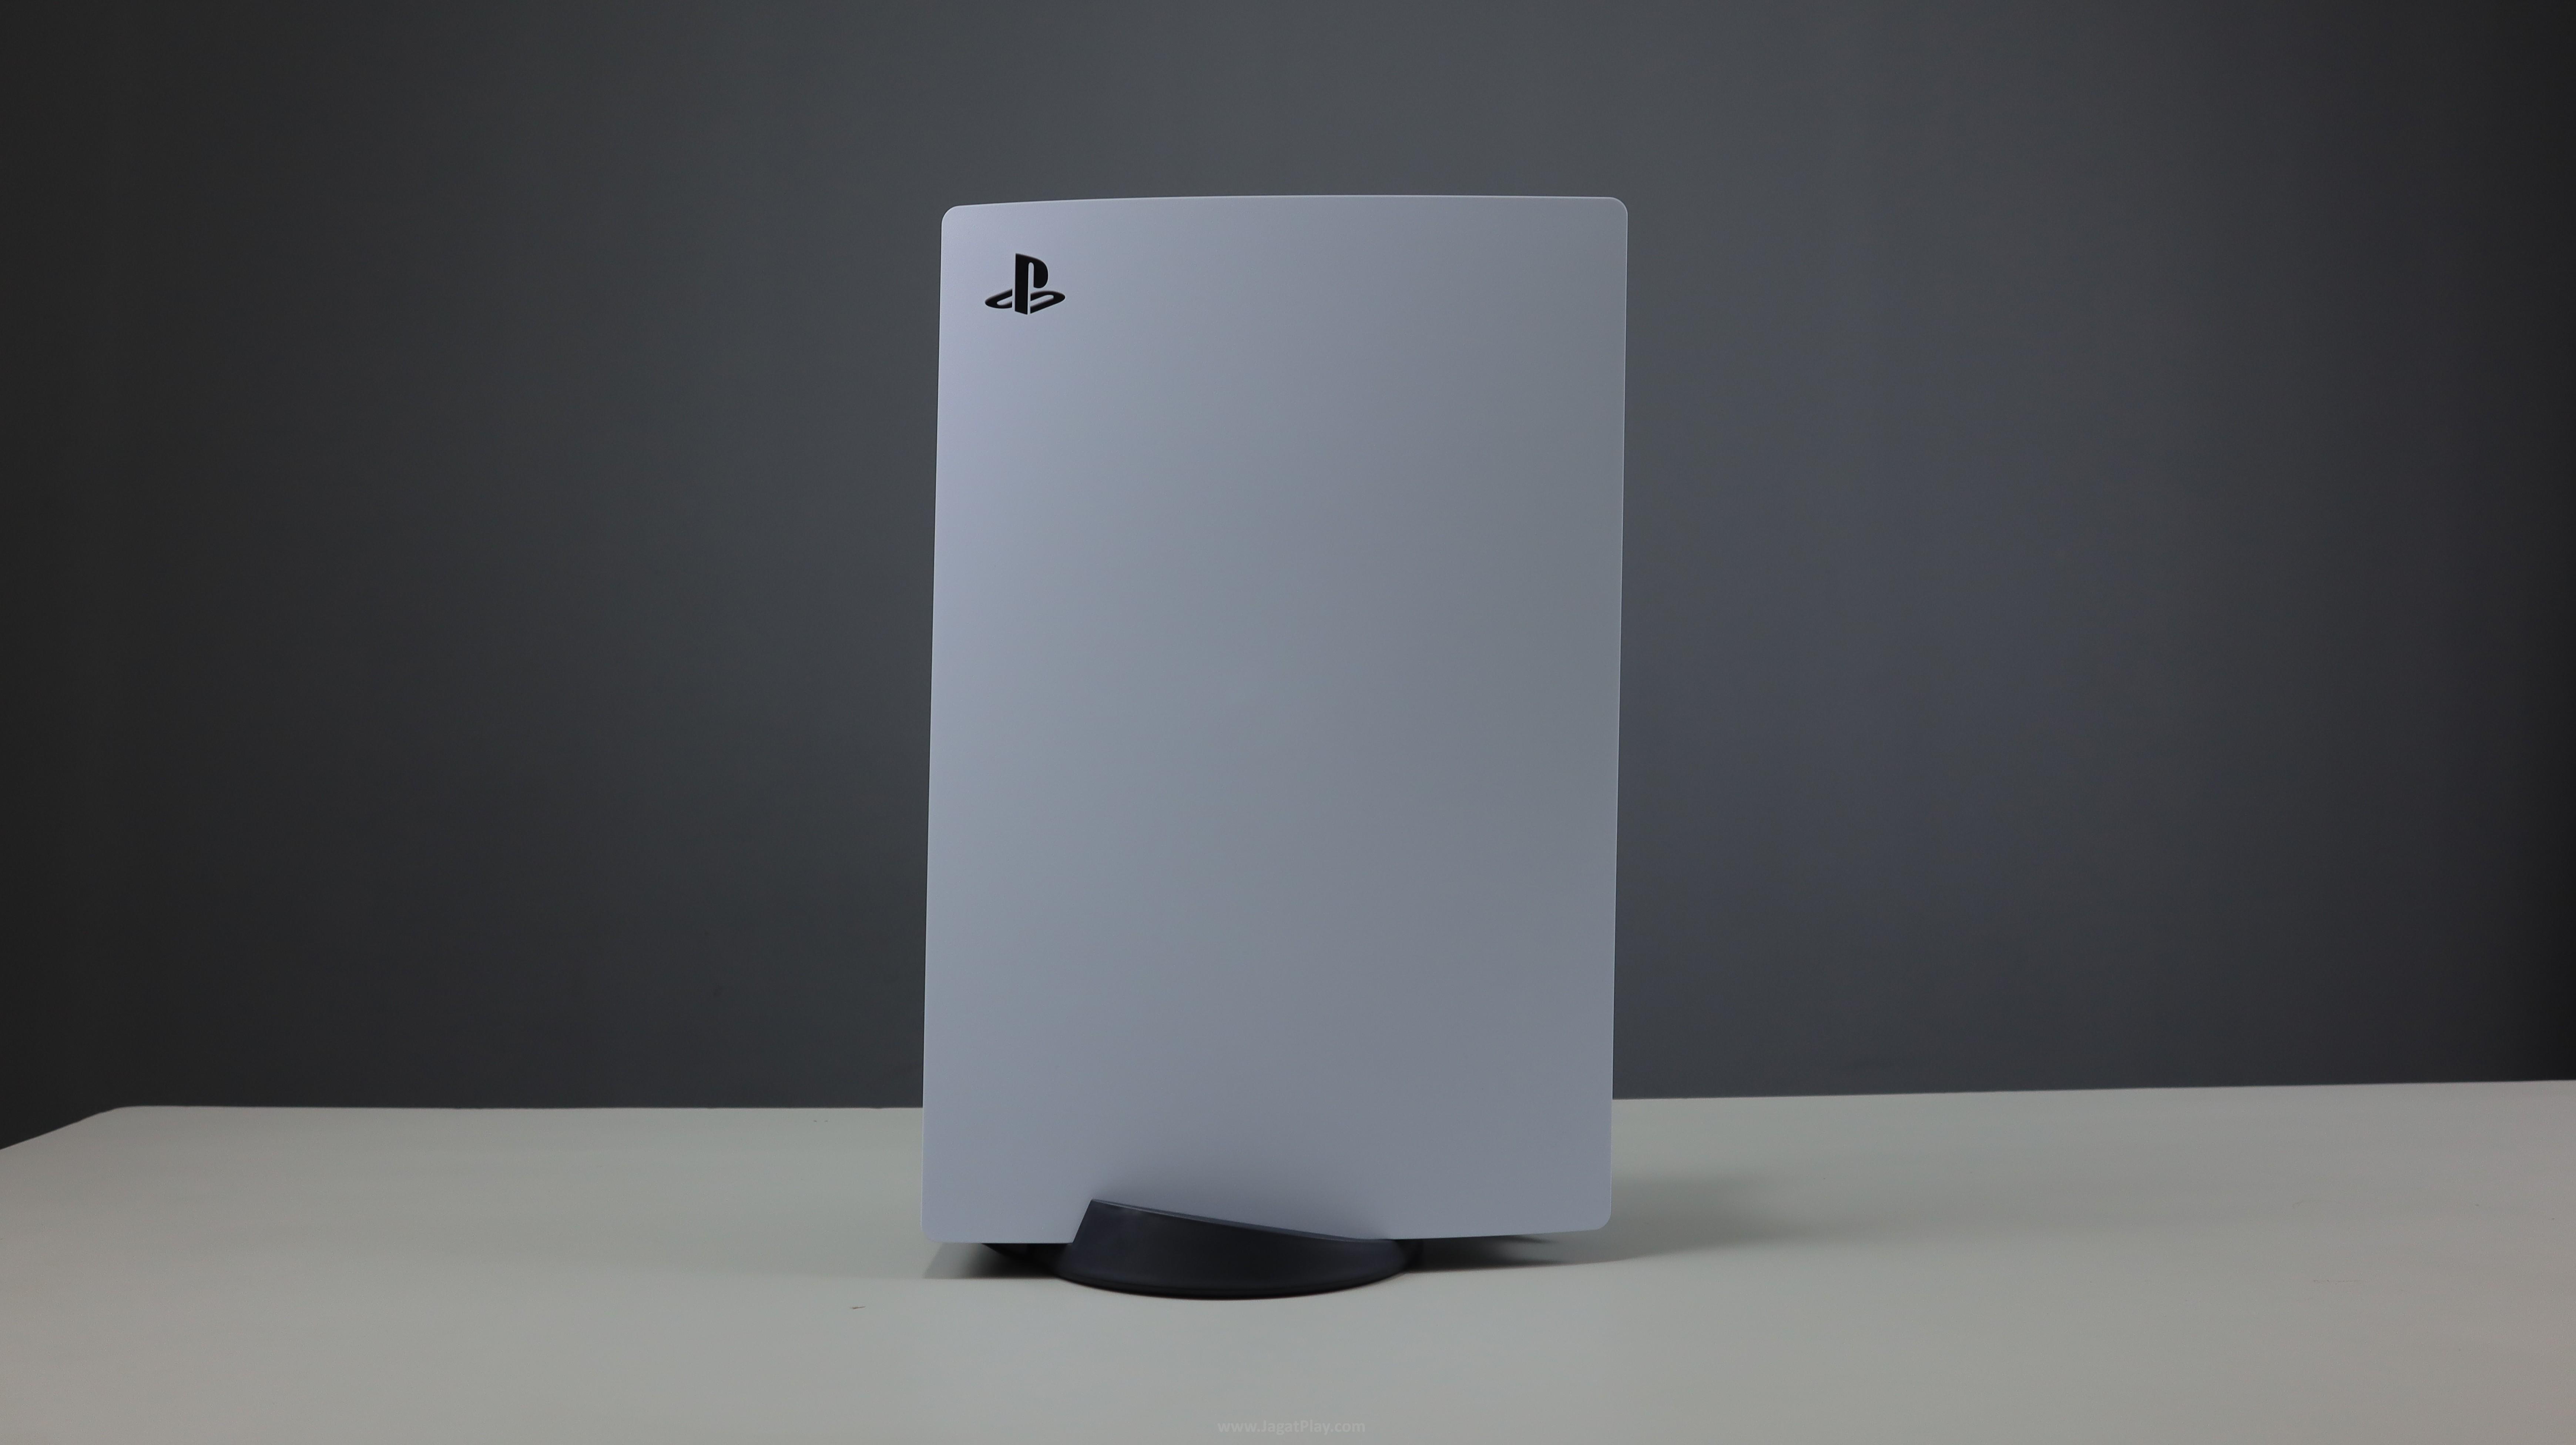 Playstation 5 jagatplay 7 1